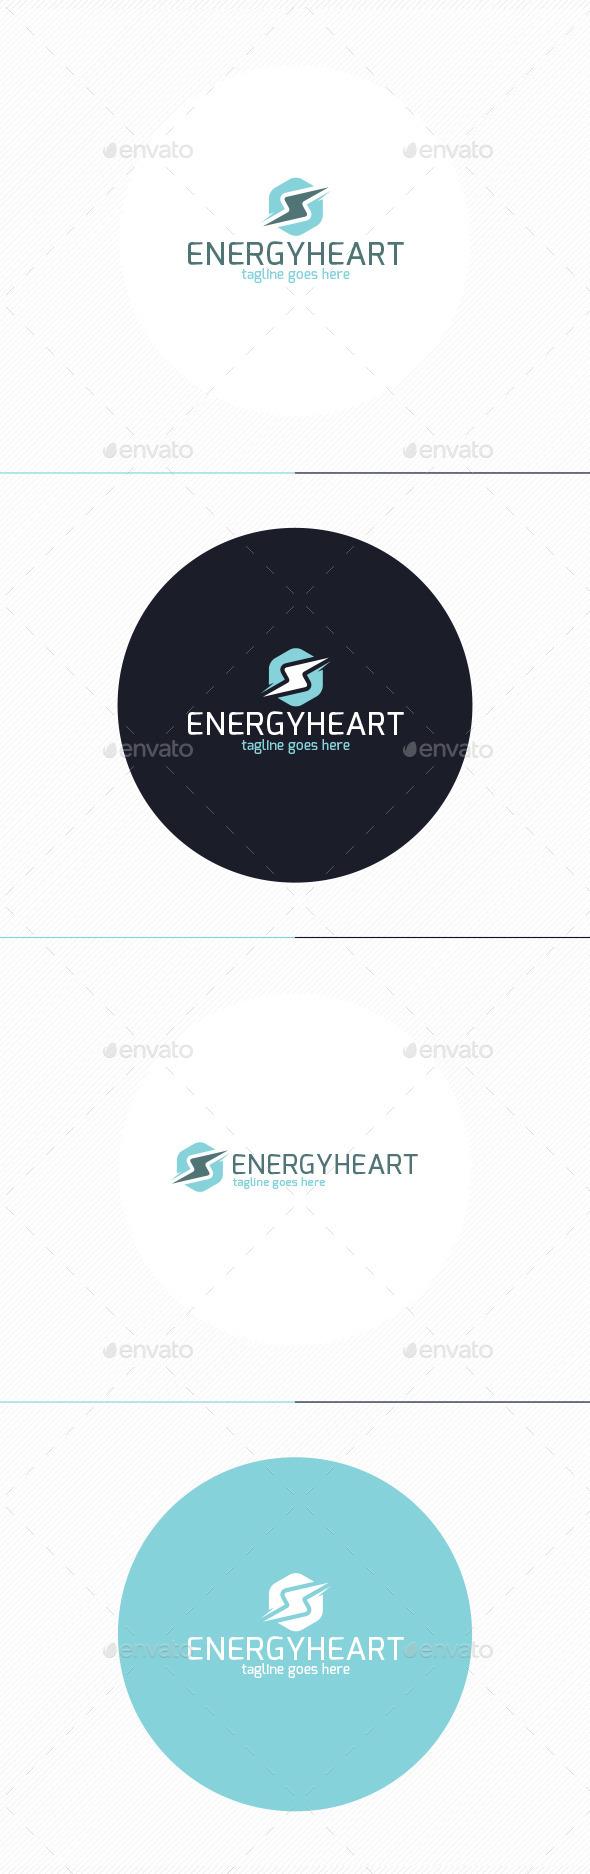 Energy Heart Logo - Vector Abstract